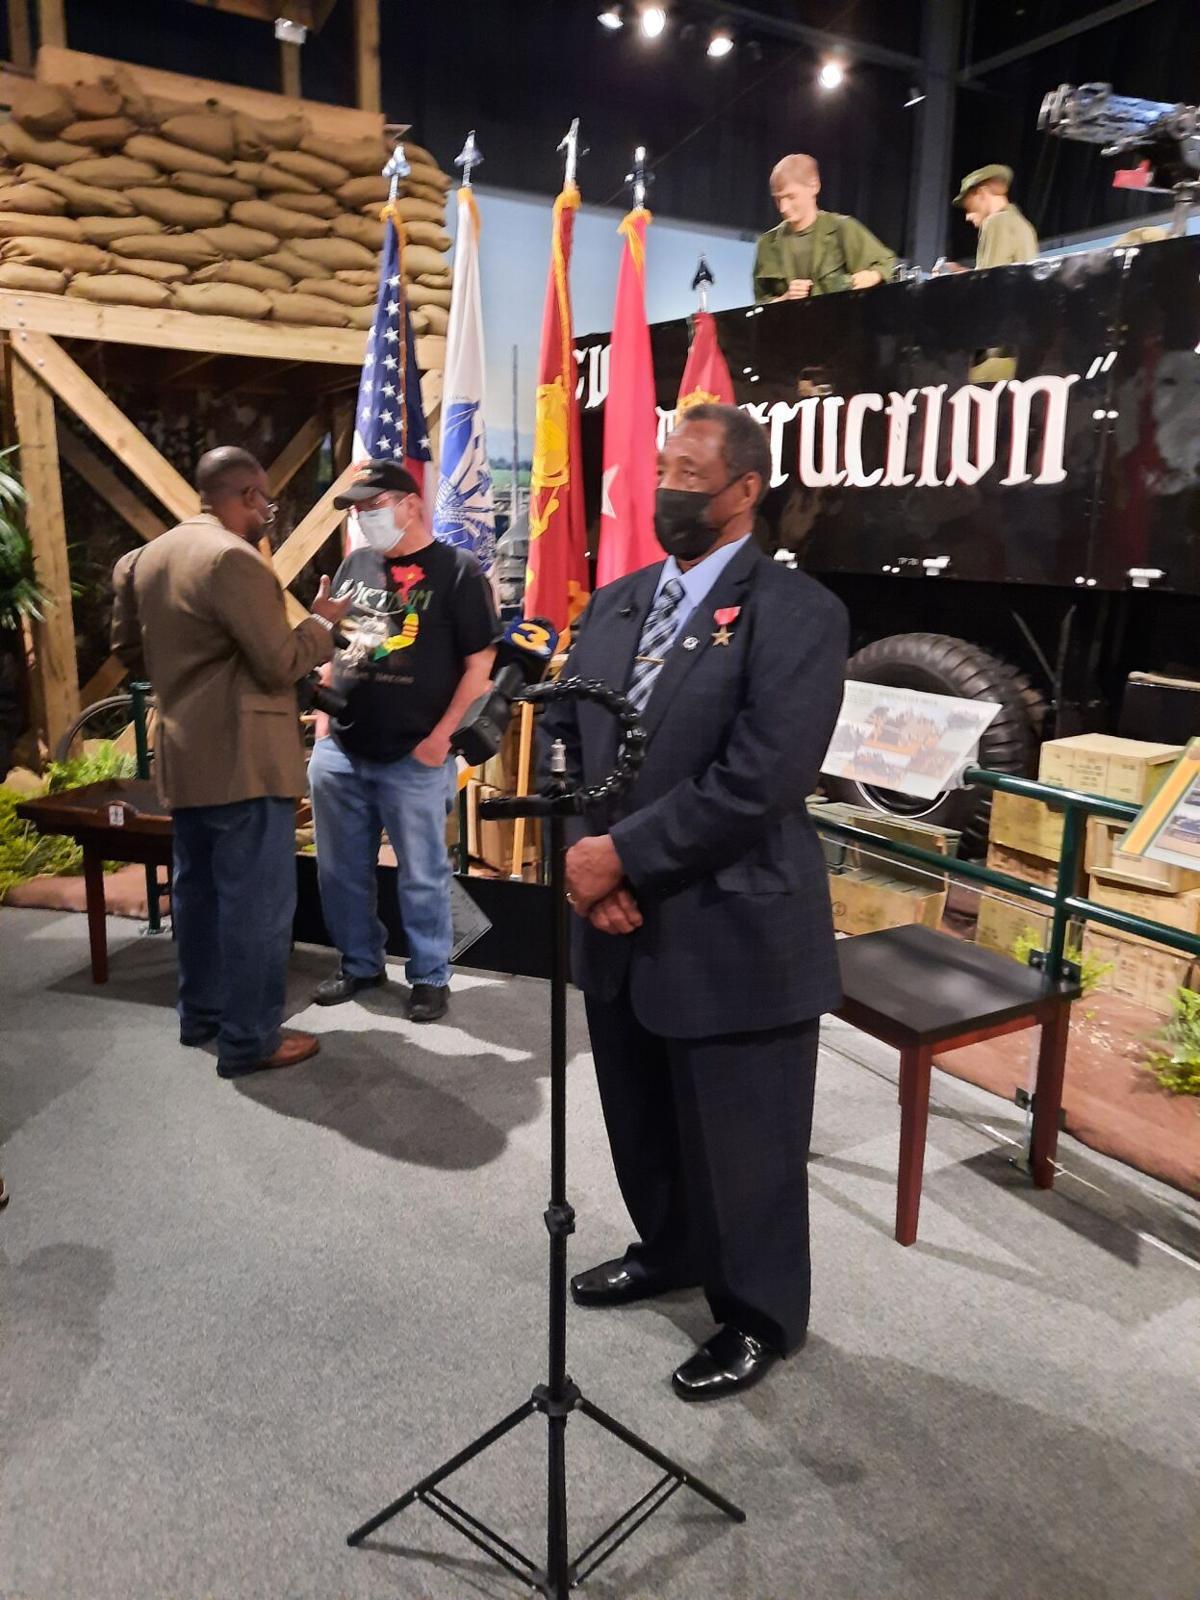 Vietnam veteran honored with Bronze Star Medal for valor